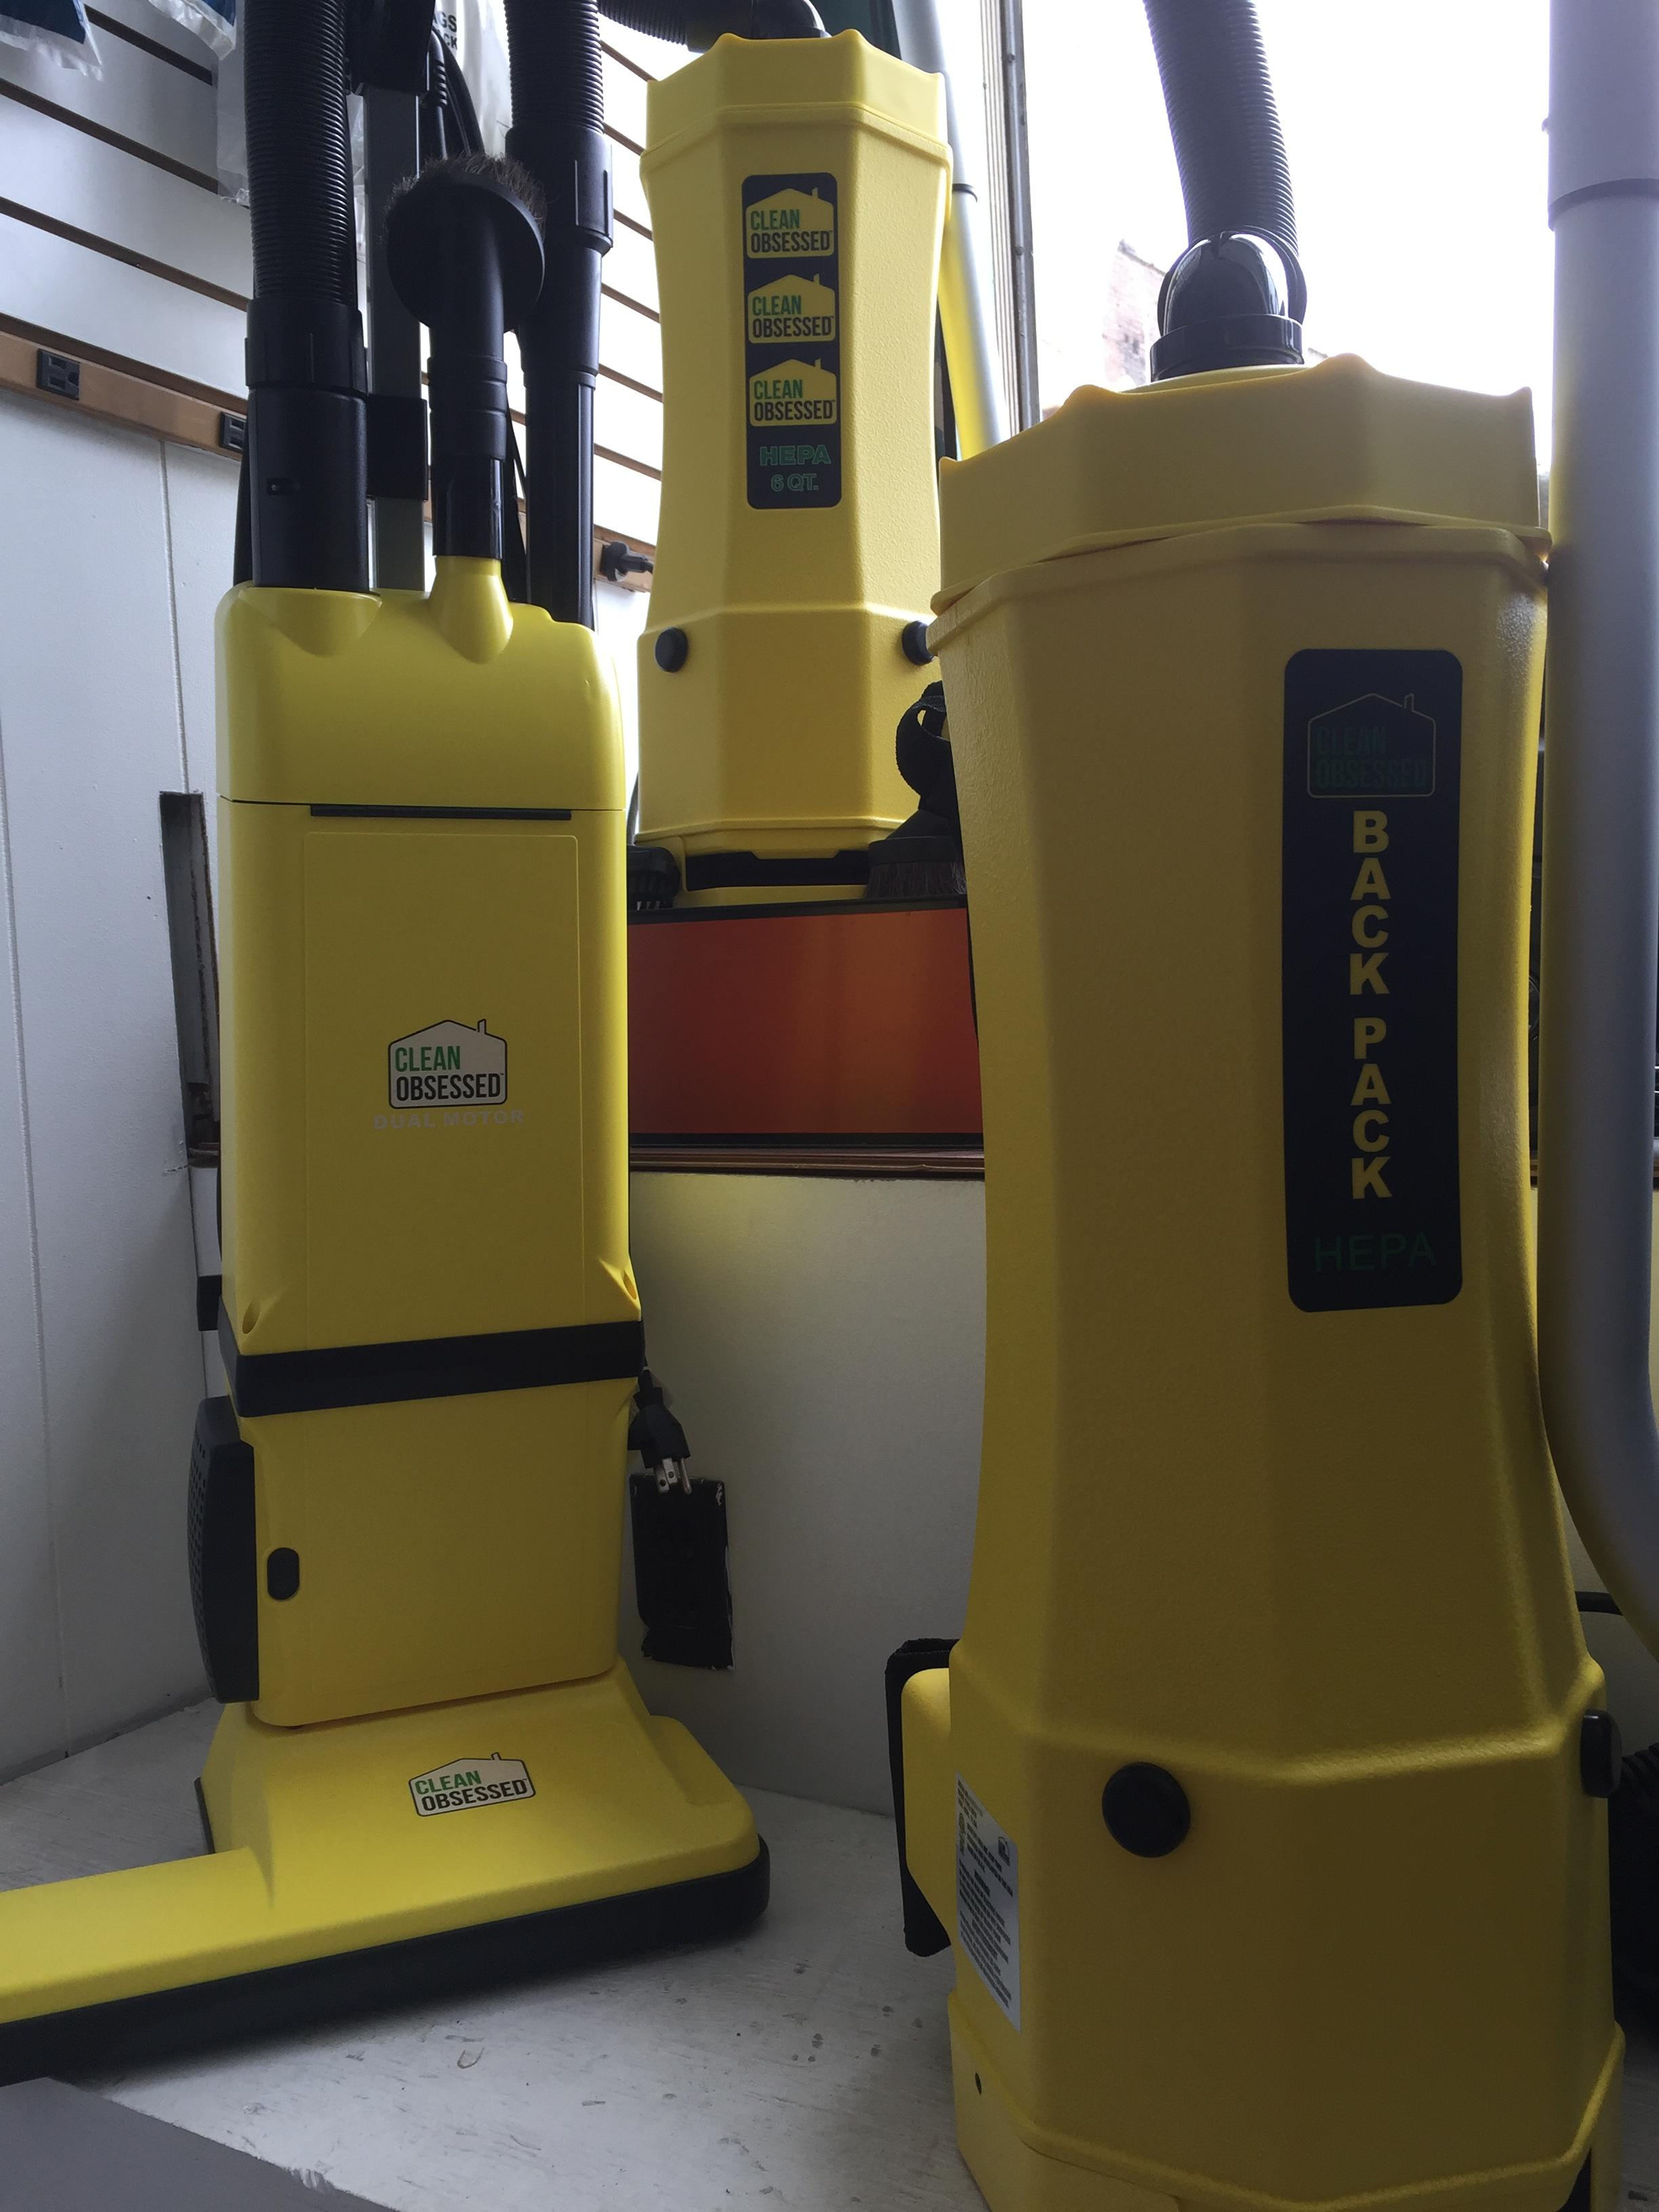 Clean Obsessed Commercial Vacuums.jpg